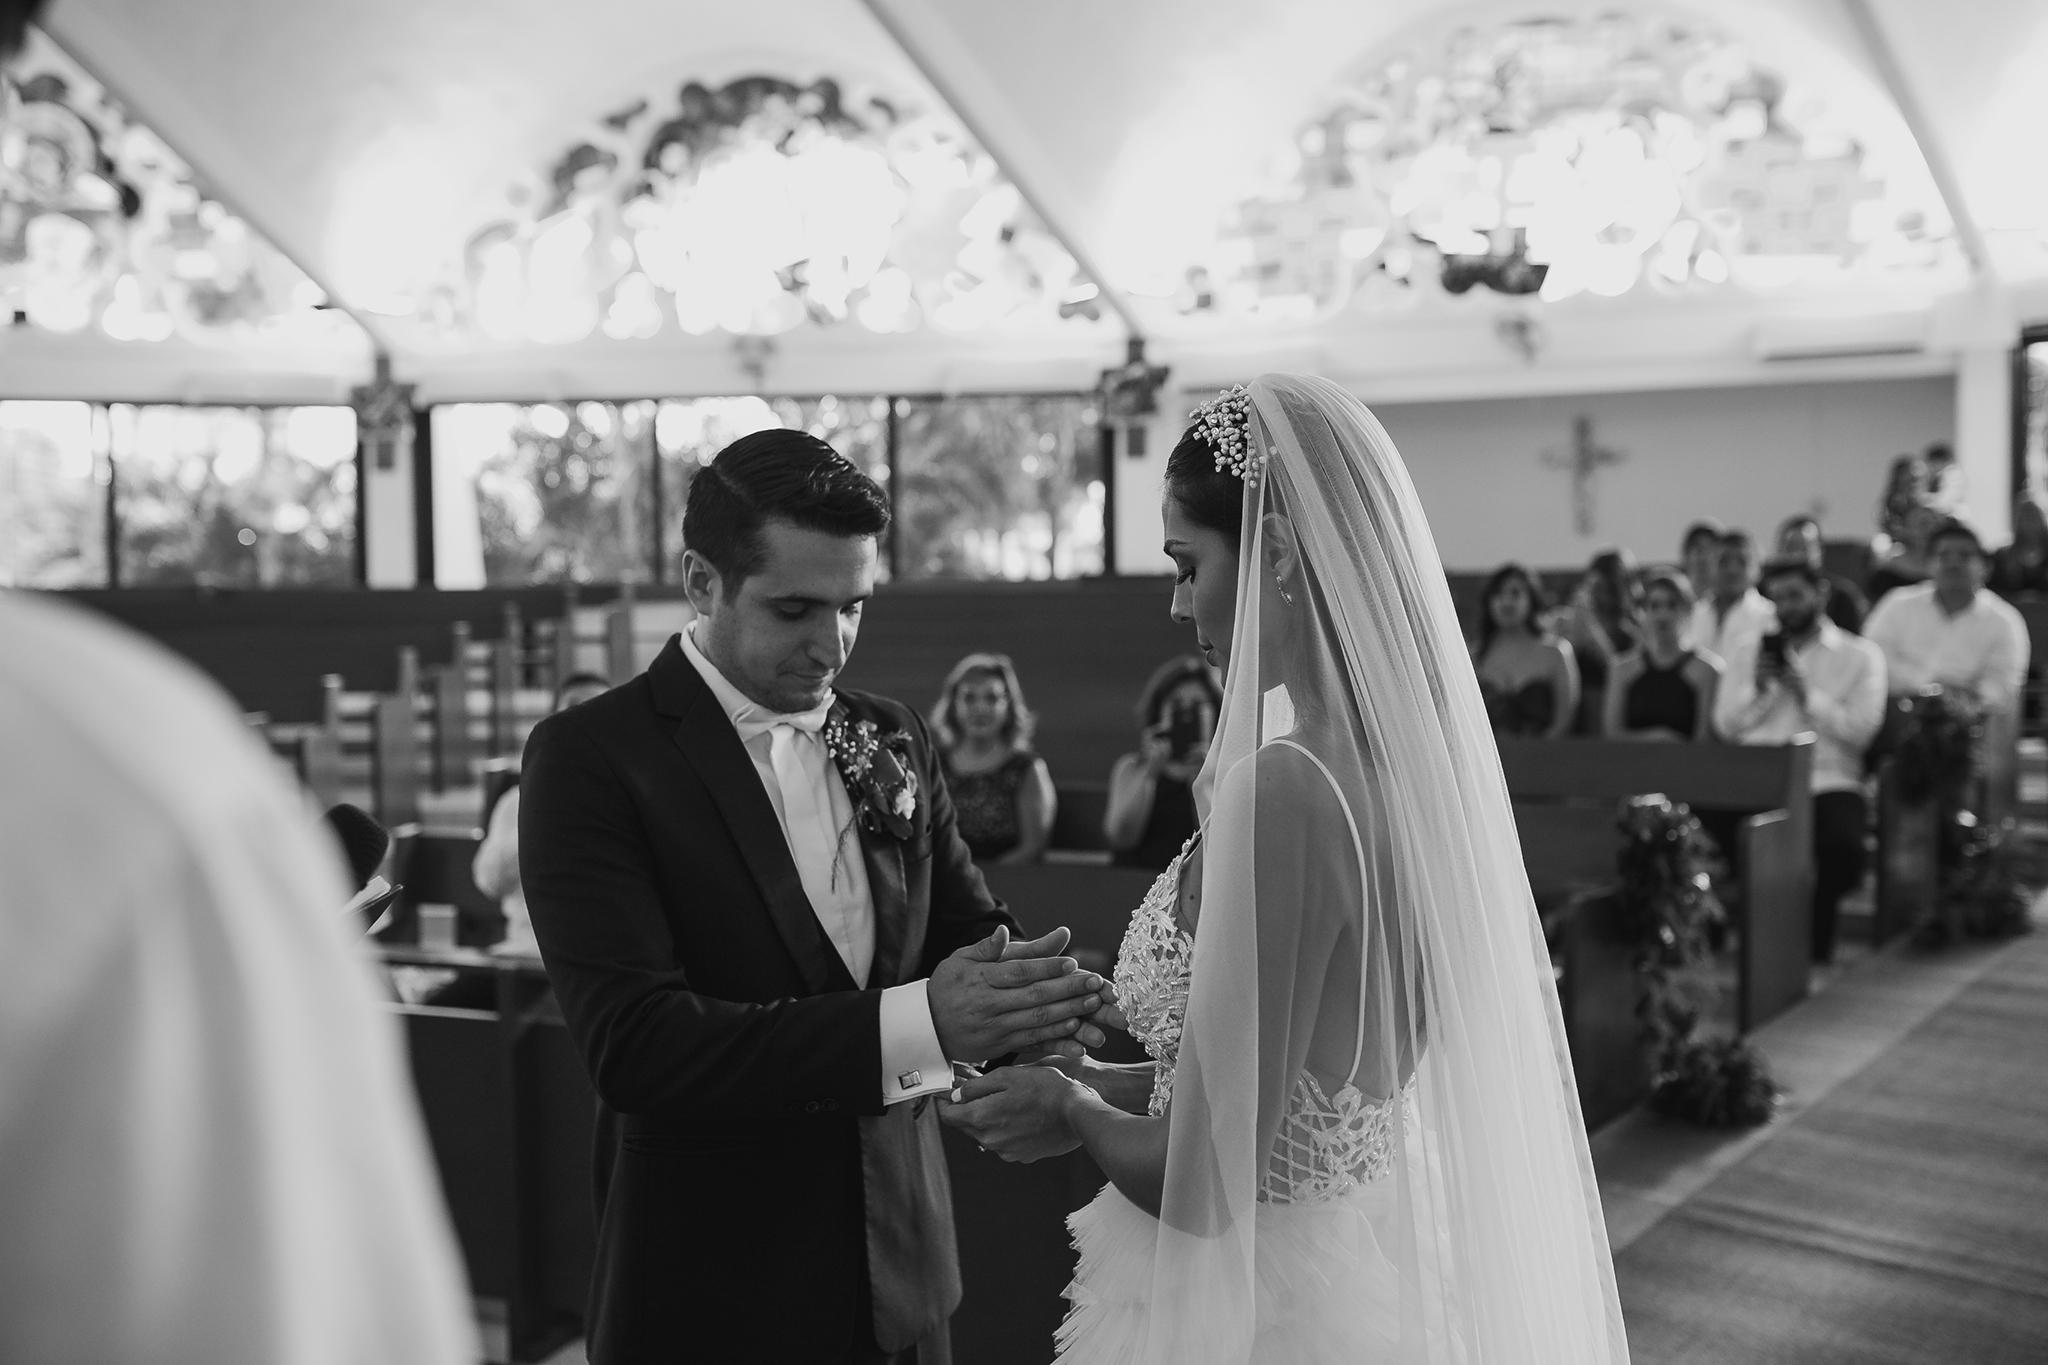 0670R&F__WeddingDestination_Weddingmerida_BodaMexico_FotografoDeBodas_FabrizioSimoneenFotografo.jpg